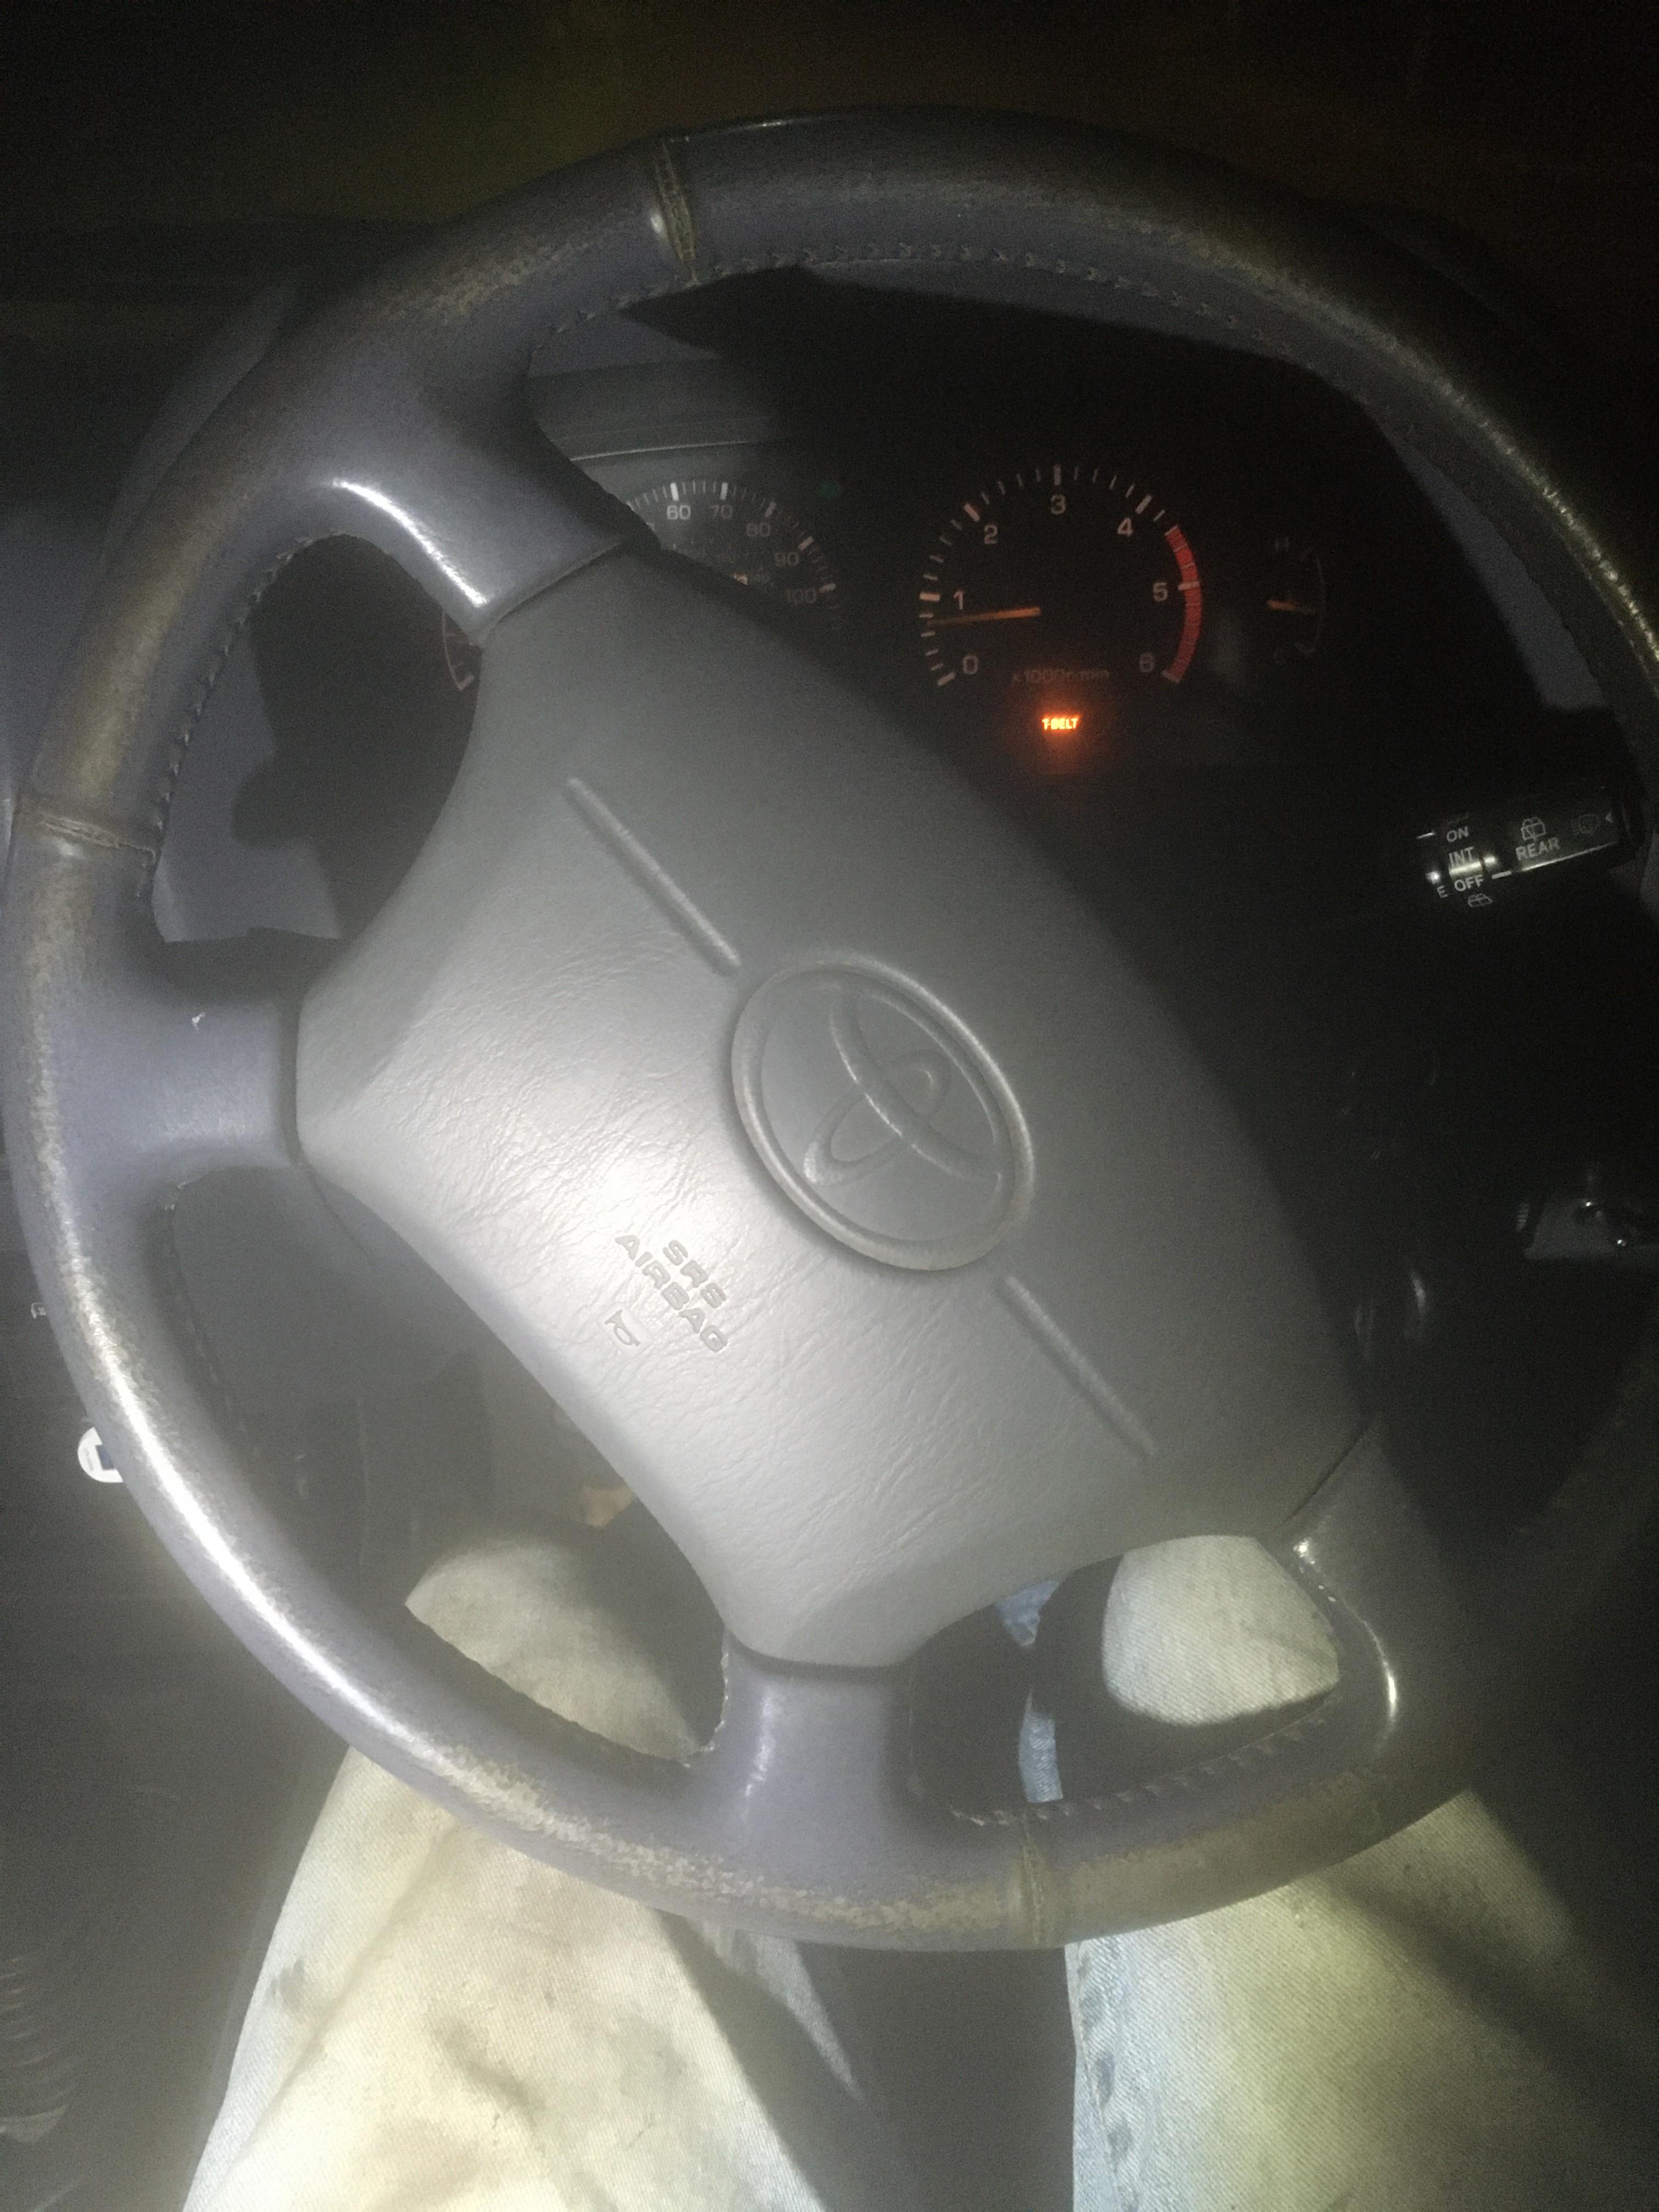 Steering-wheel-off-centre.jpg